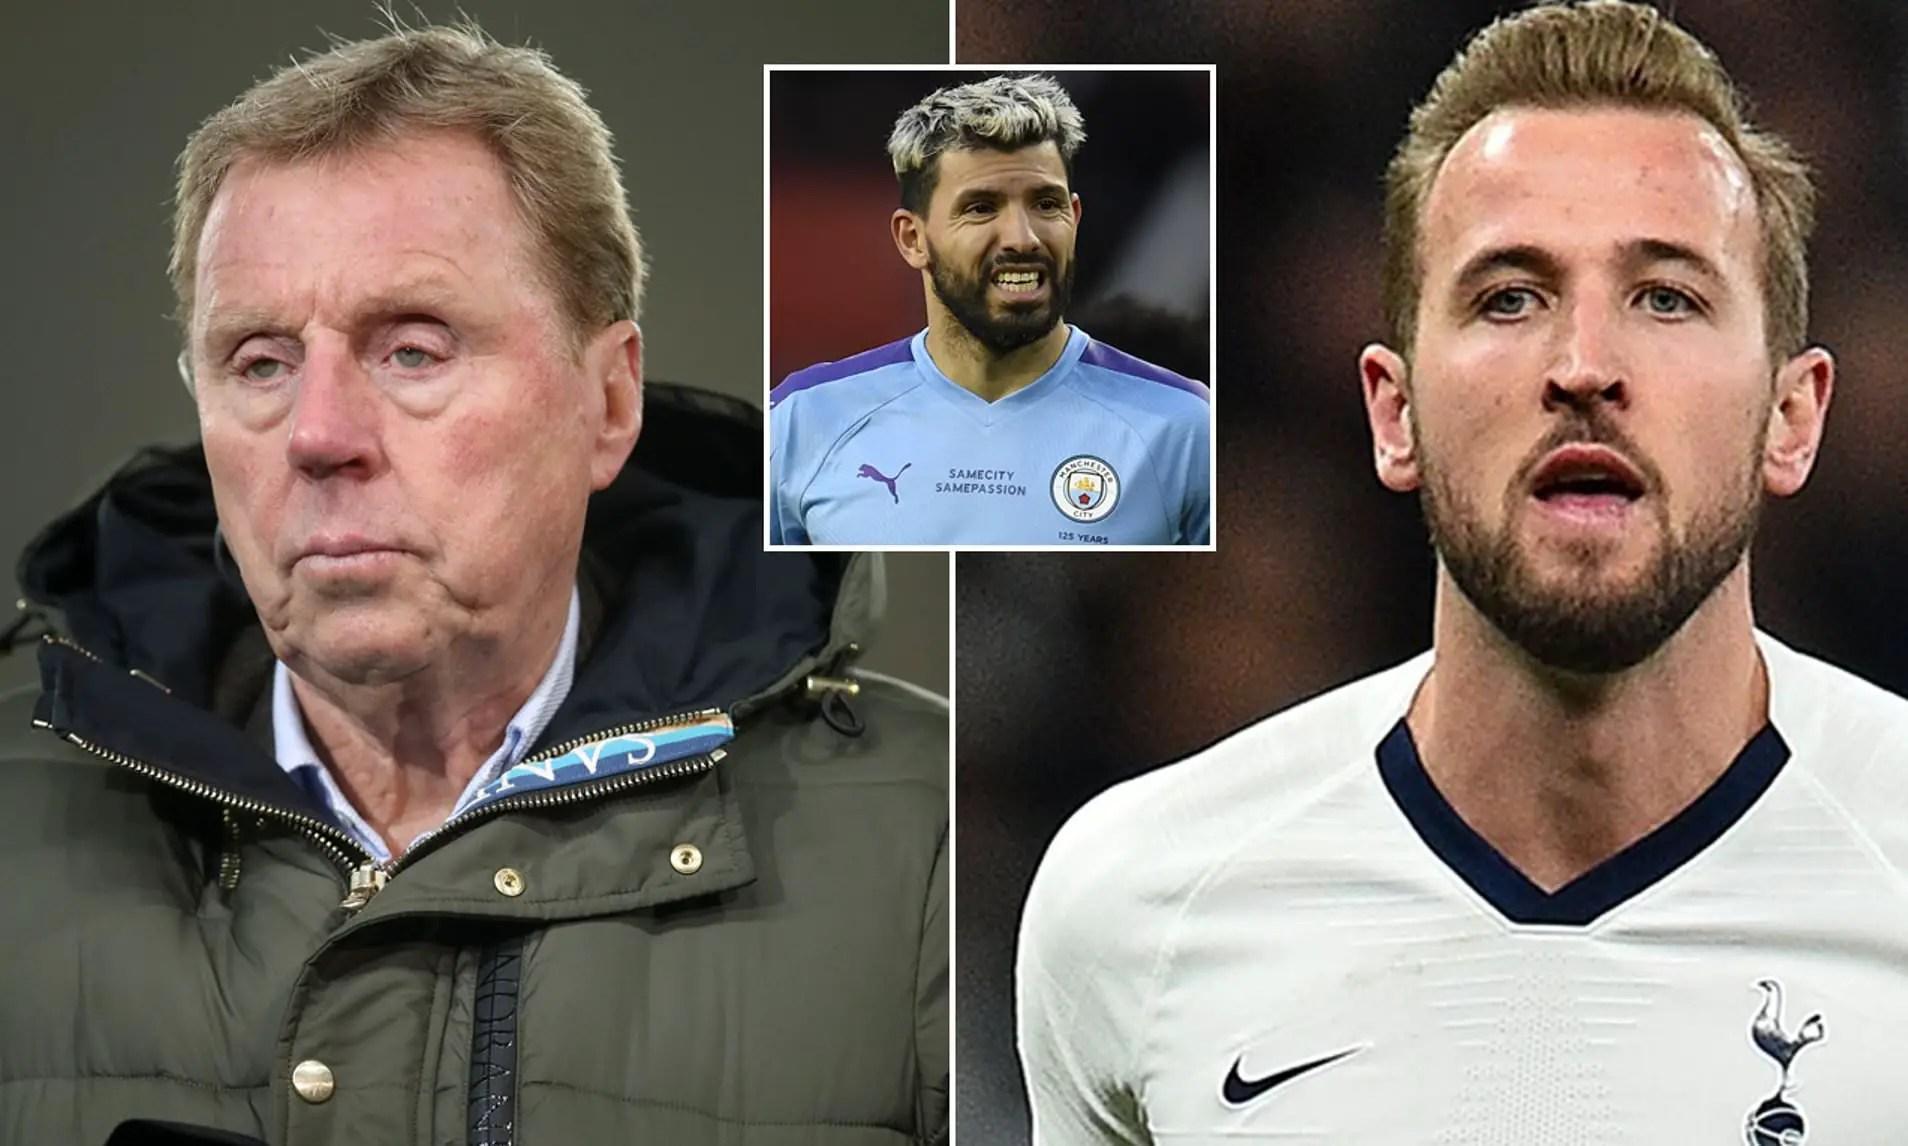 Redknapp Warns Kane Could Leave Spurs Over Lack Of Trophies